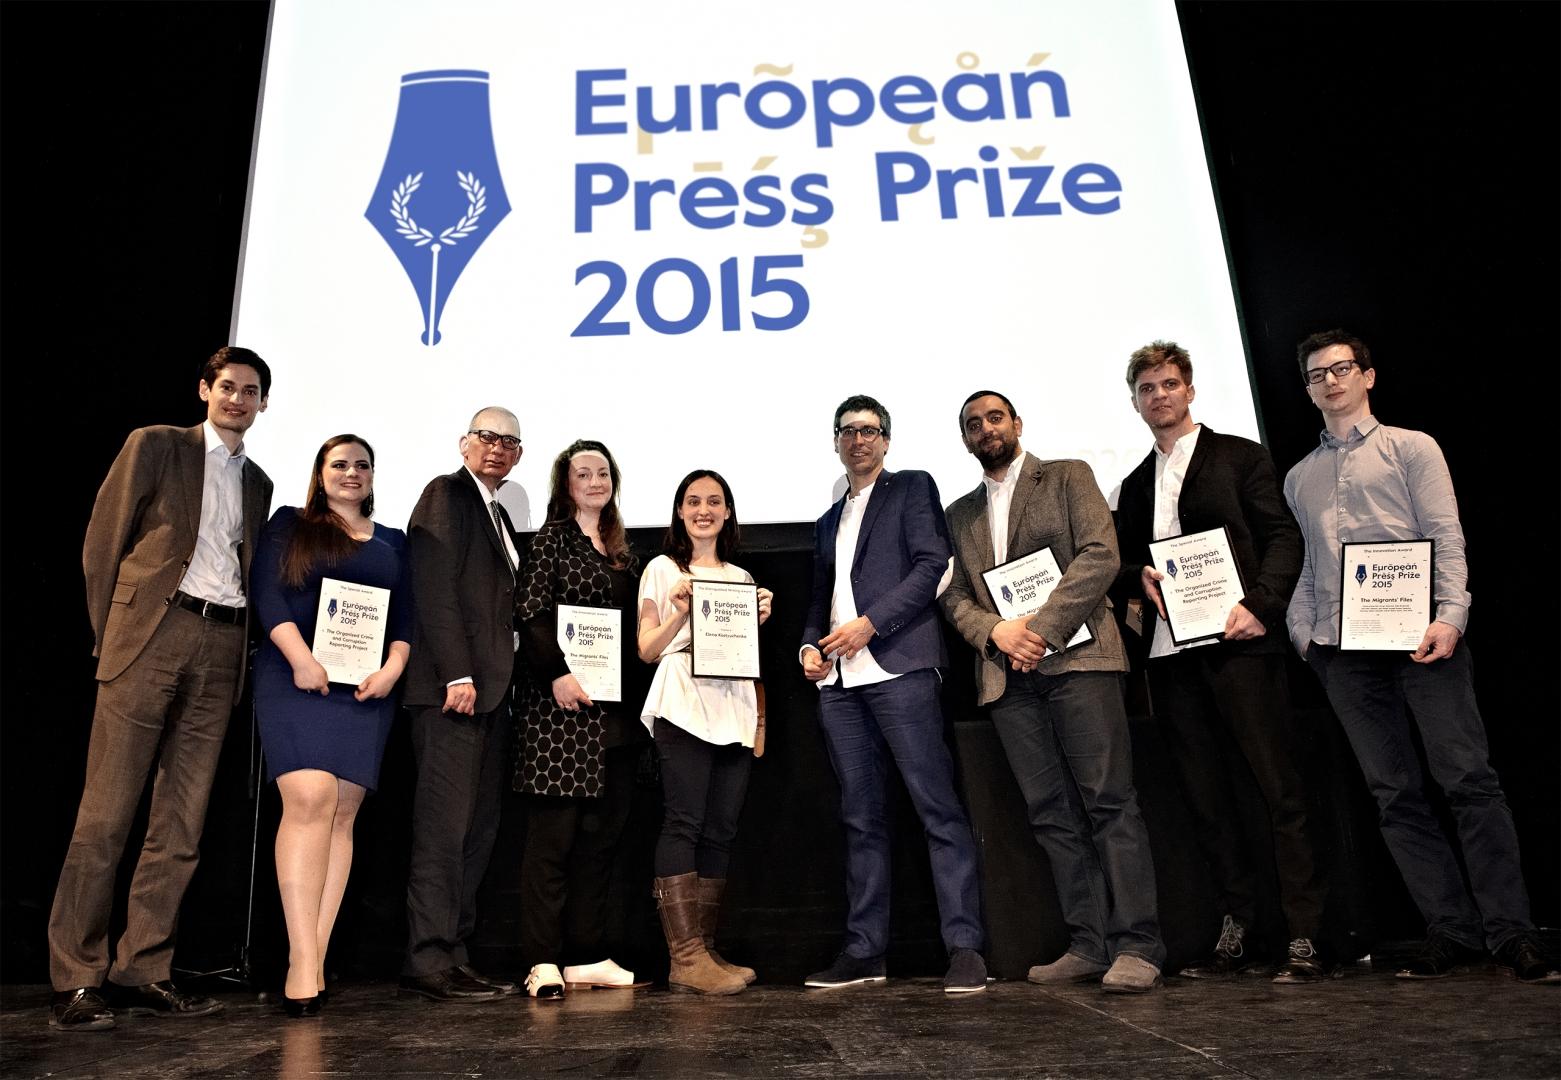 European Press Prize ceremony